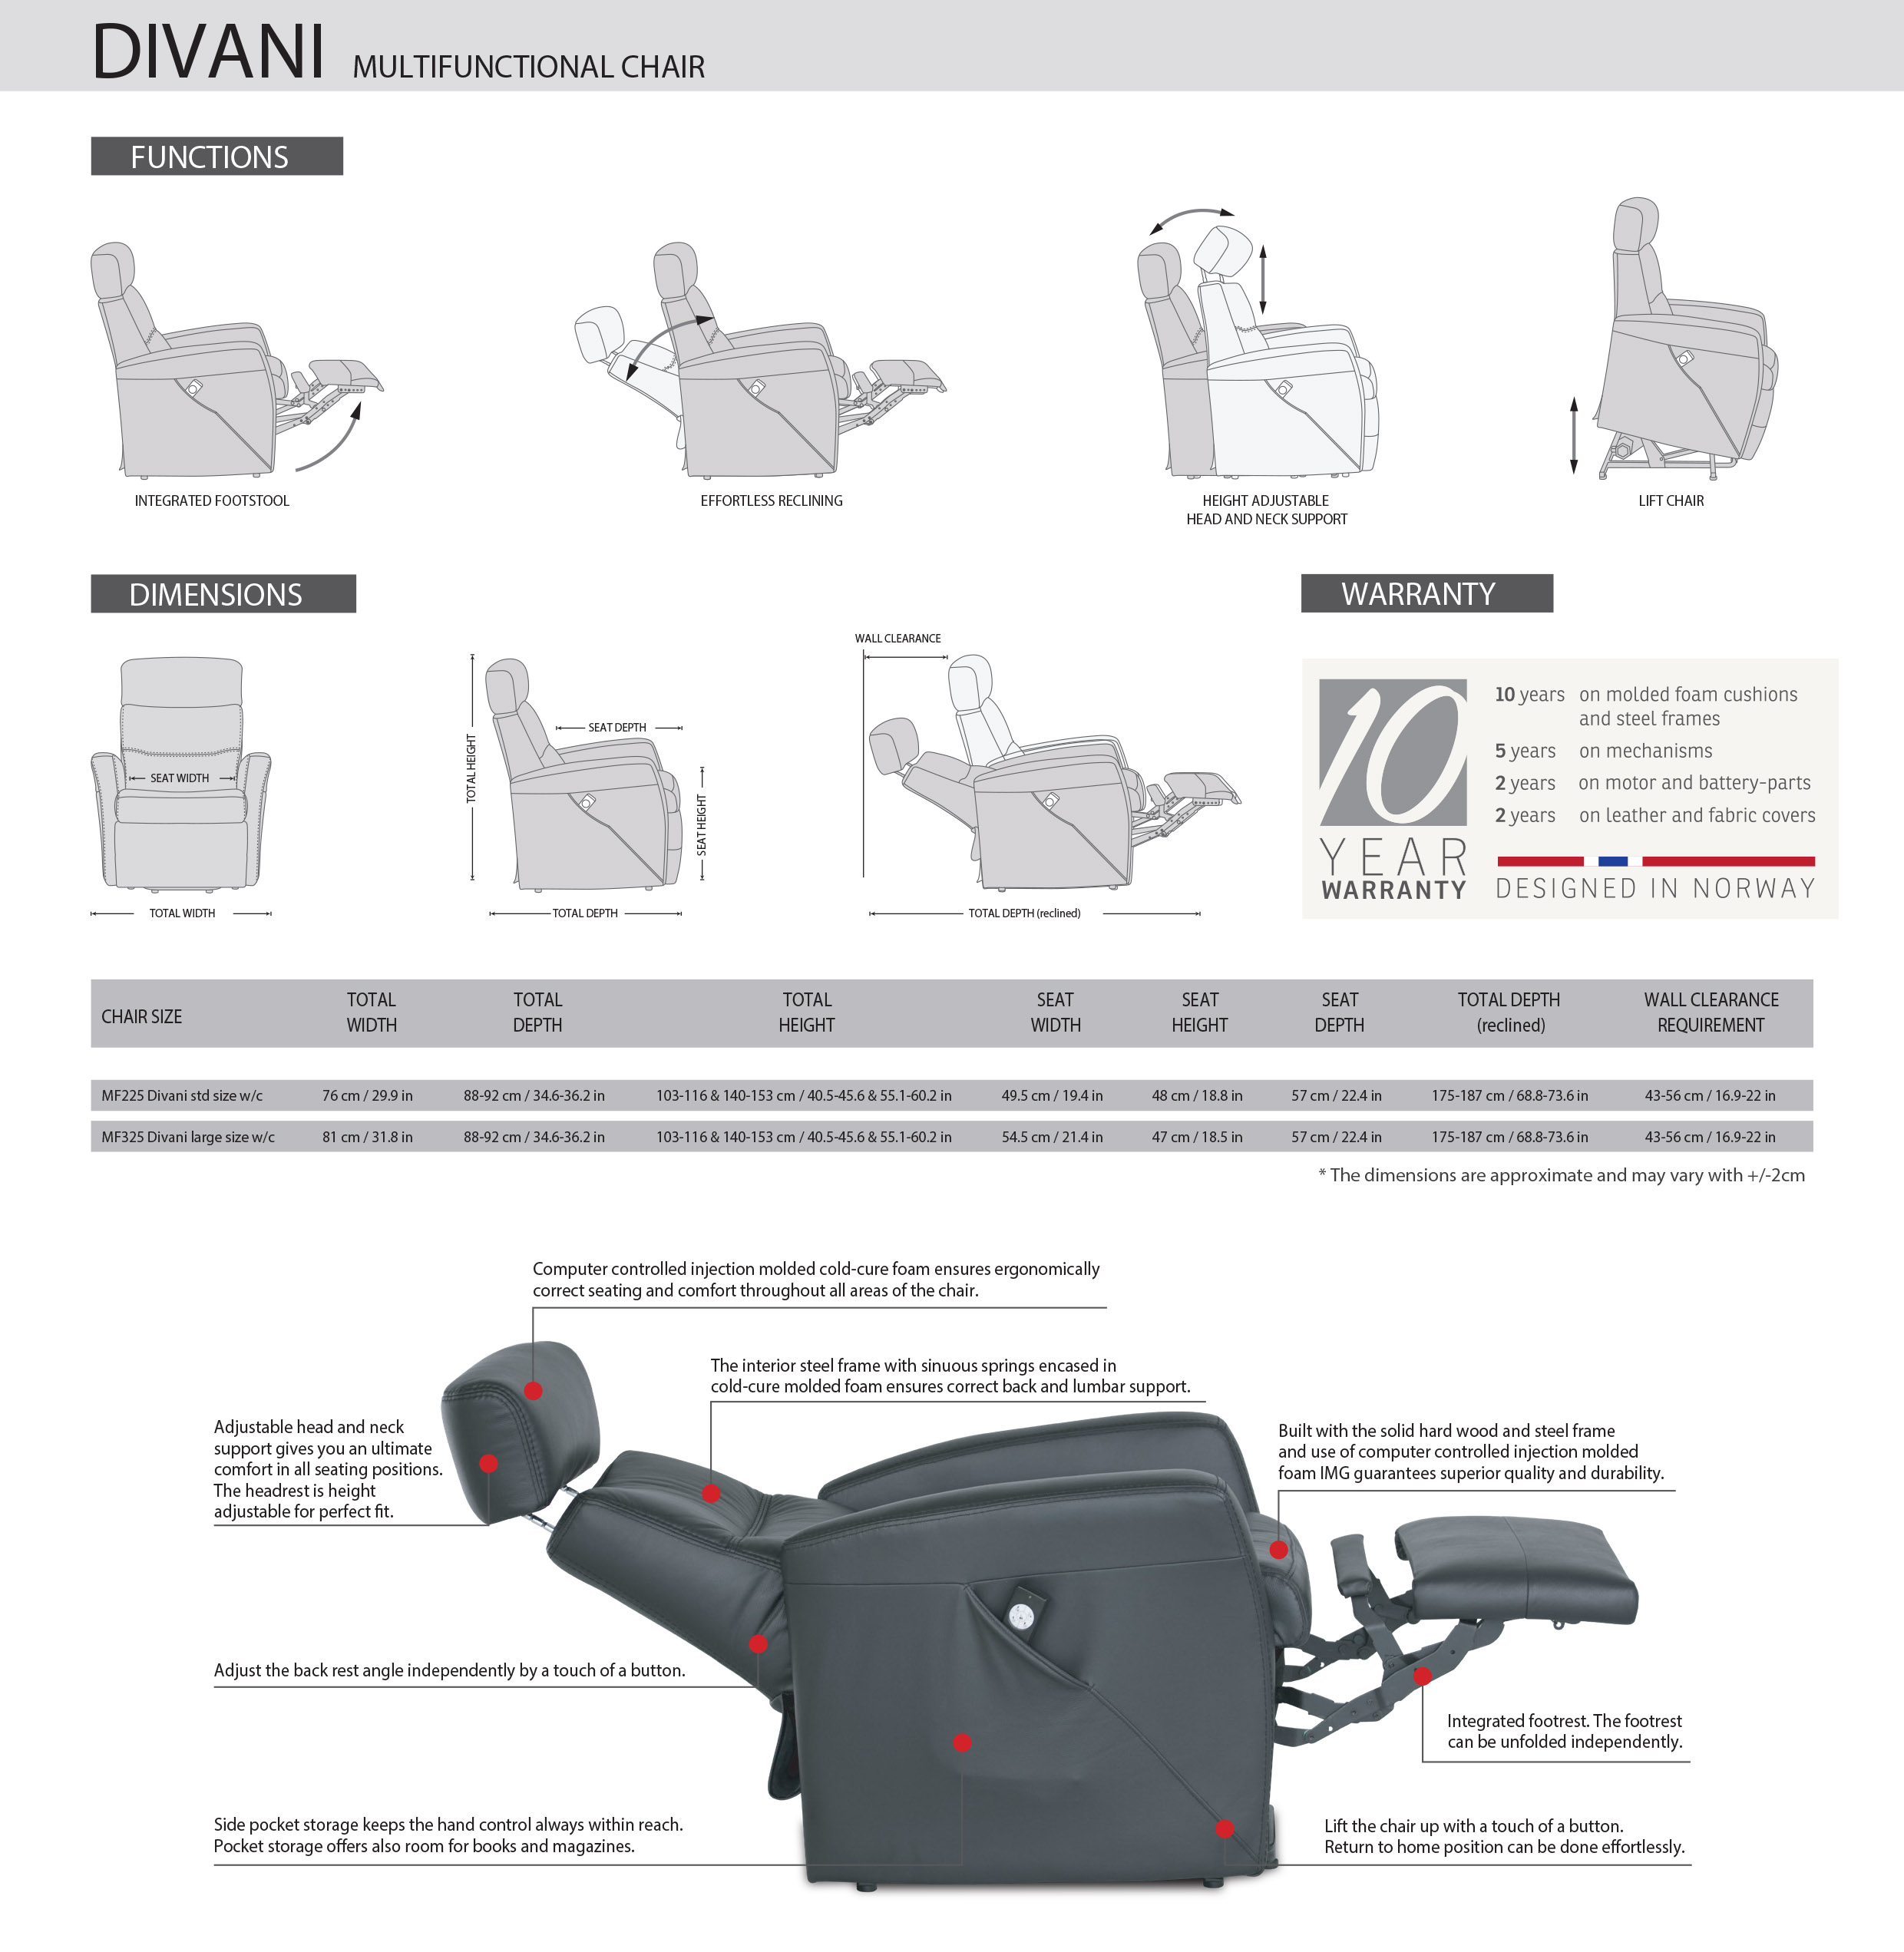 Divani Multi-function Recliner Dimensions